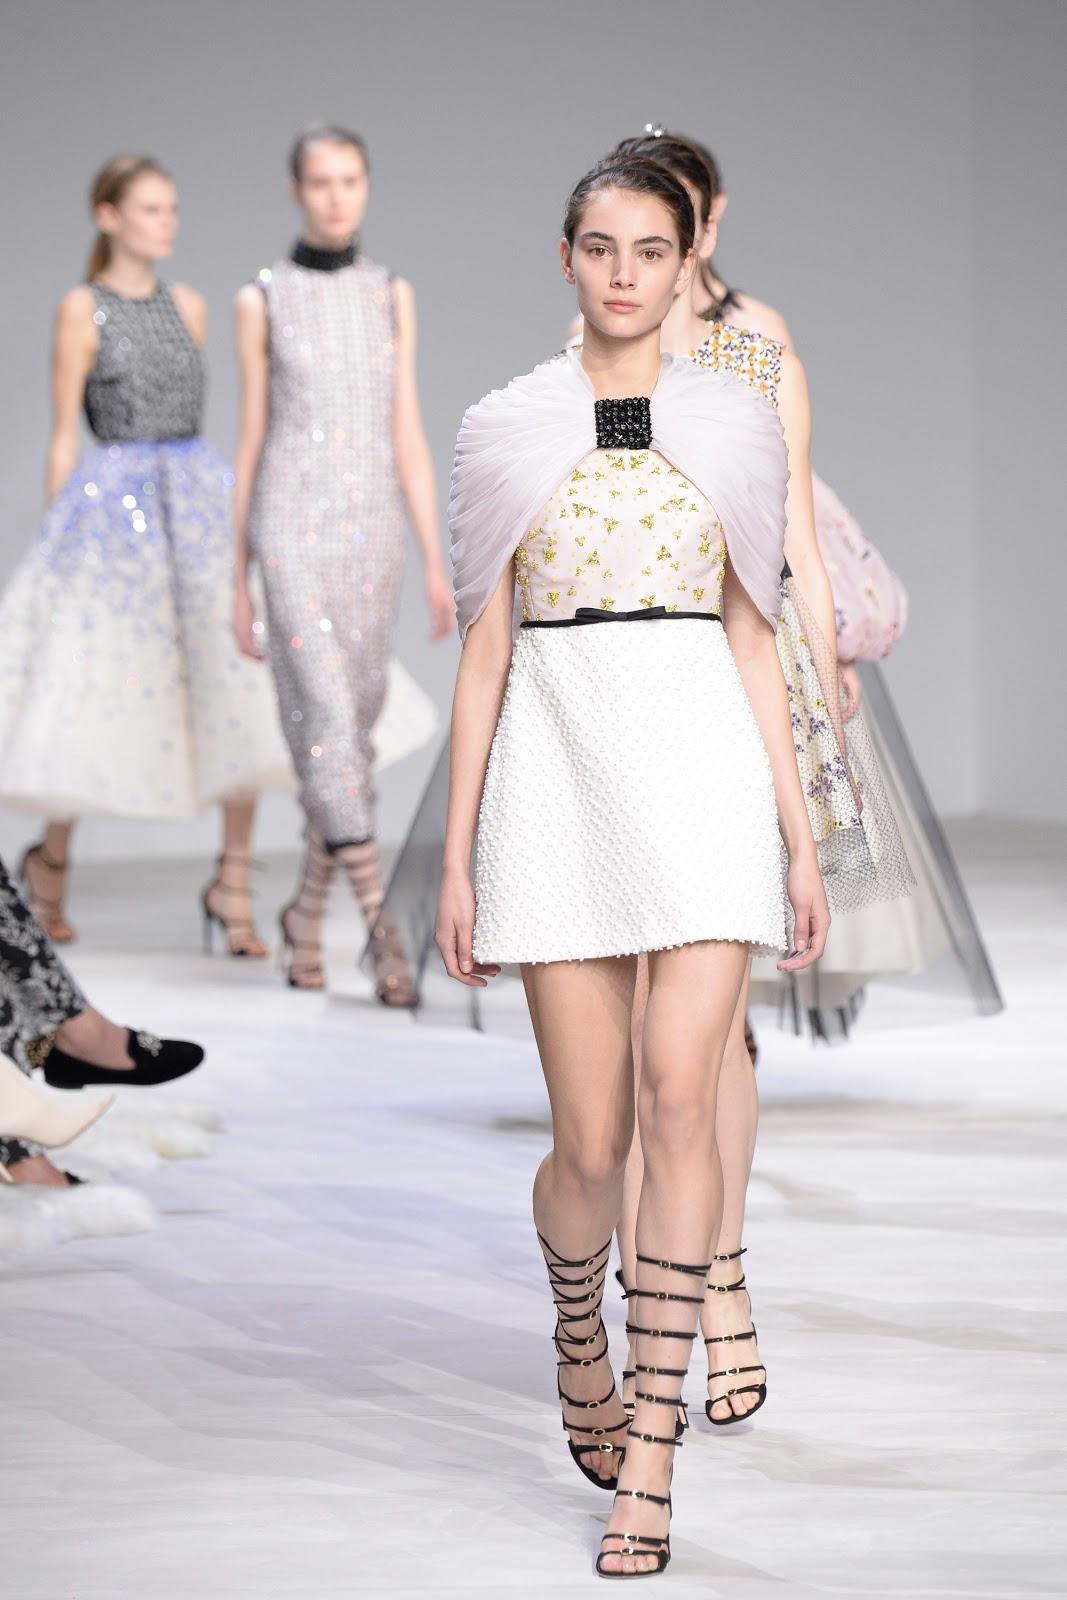 Fashion runway giambattista valli spring 2016 couture cool chic